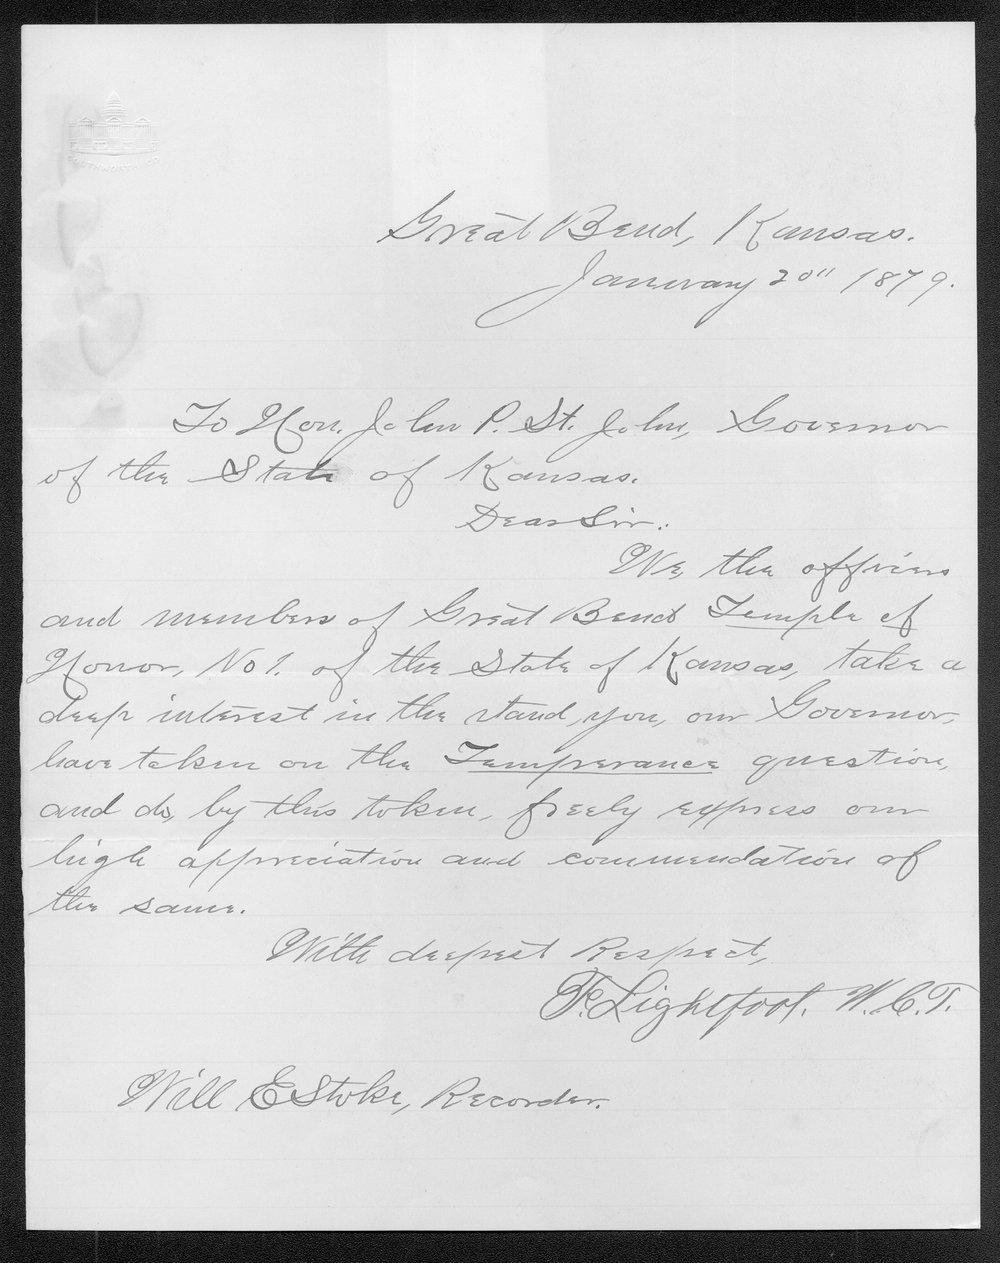 Governor John St. John prohibition received correspondence - 1